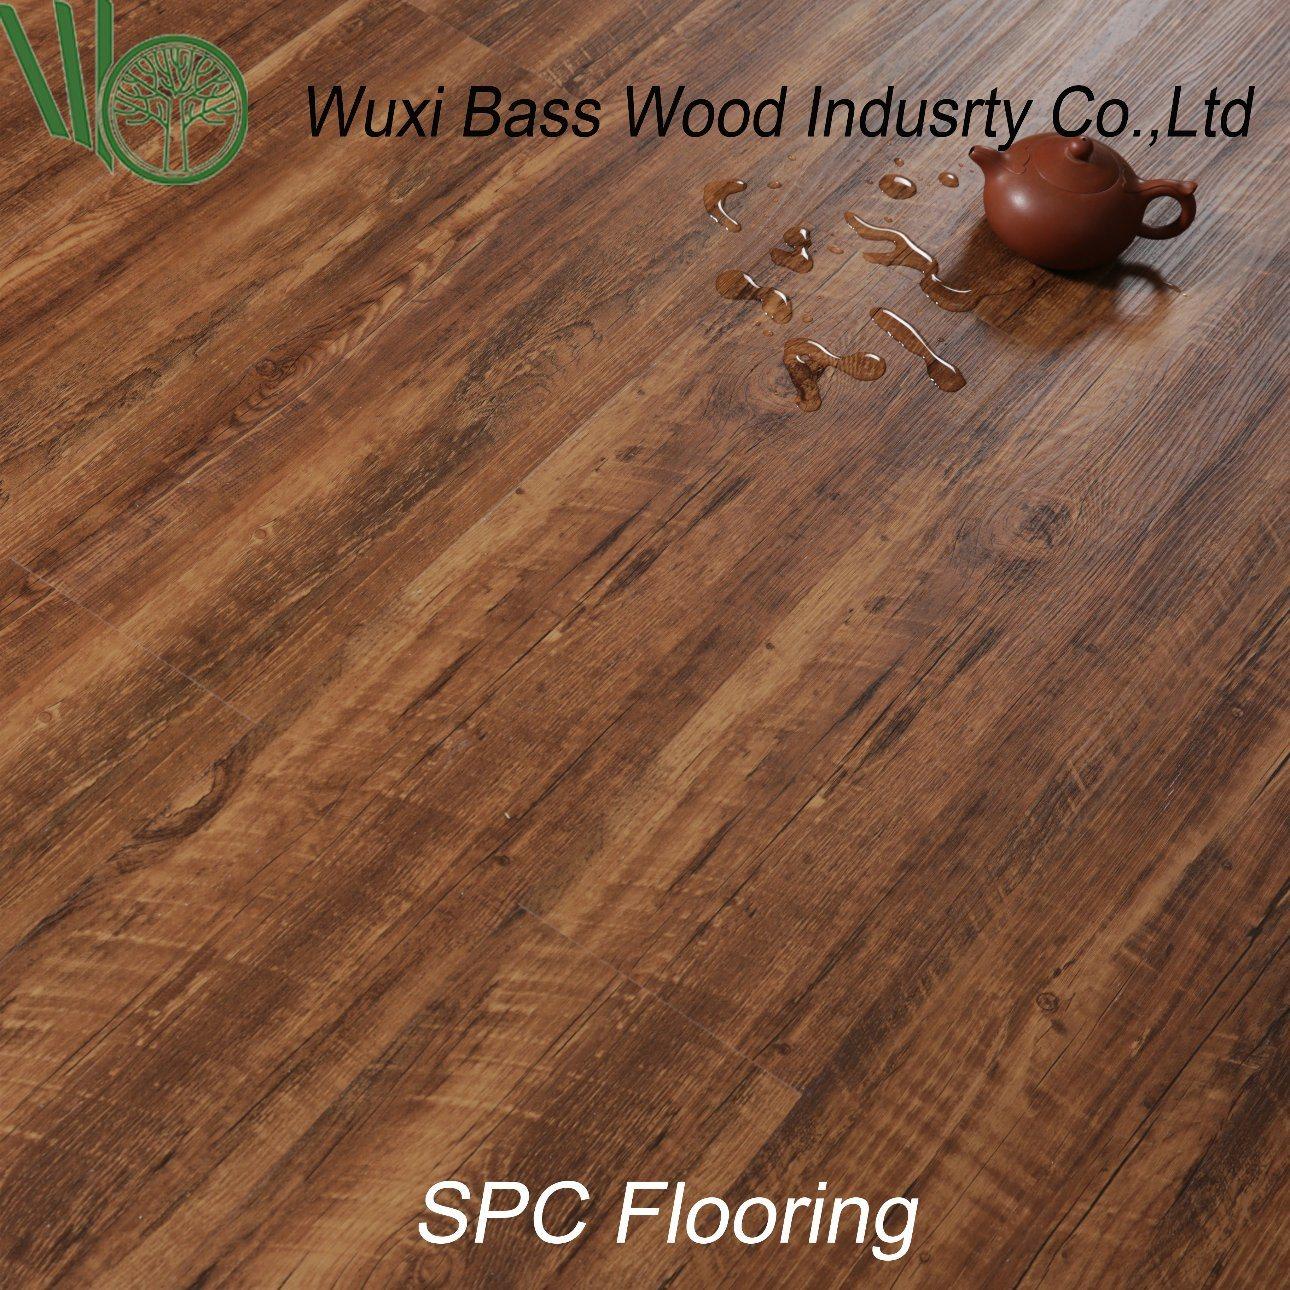 Uv Coating Spc Flooring 4mm 5mm